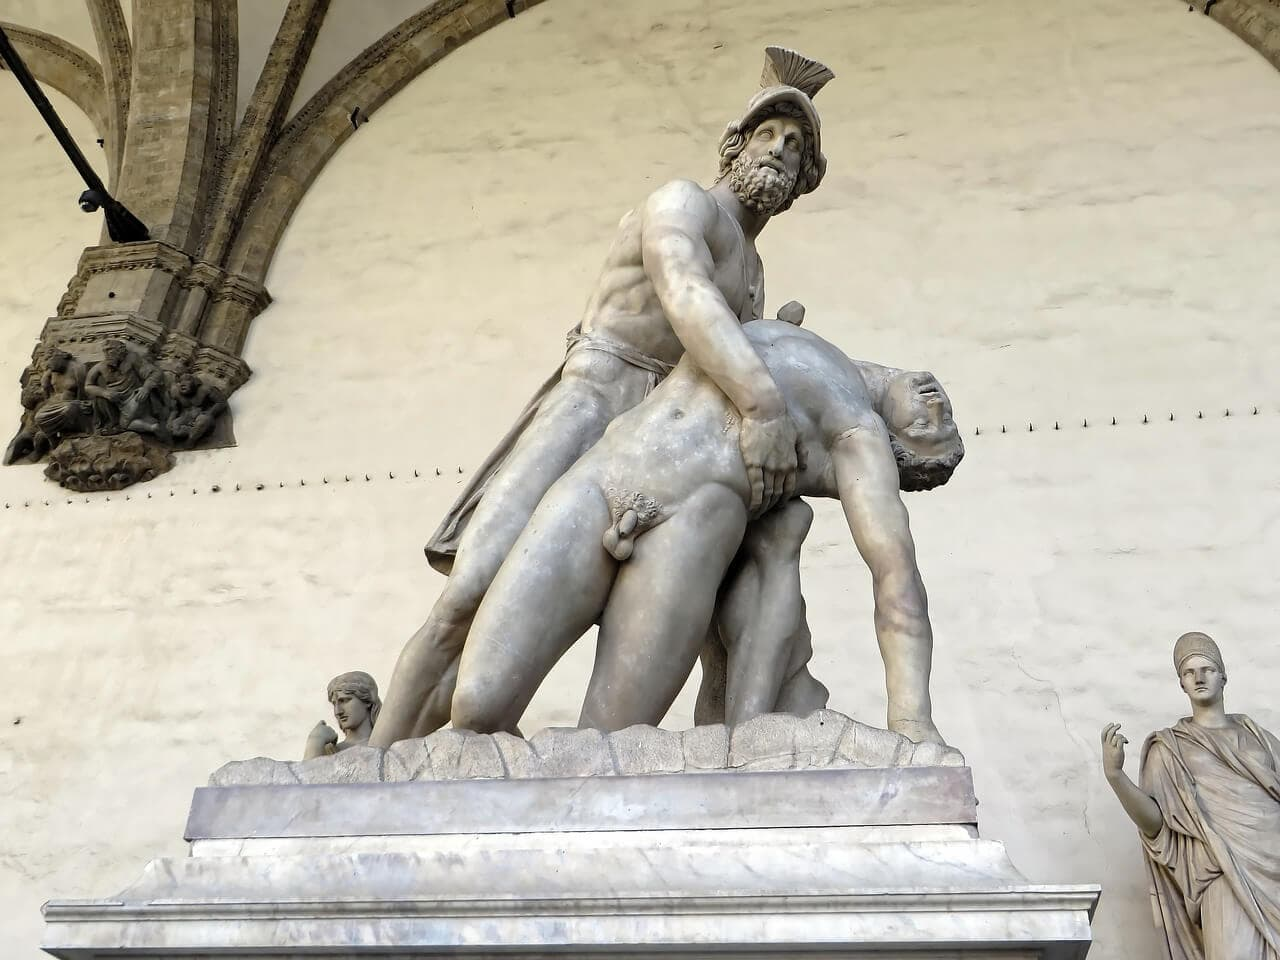 Menelaus carries Patroclus